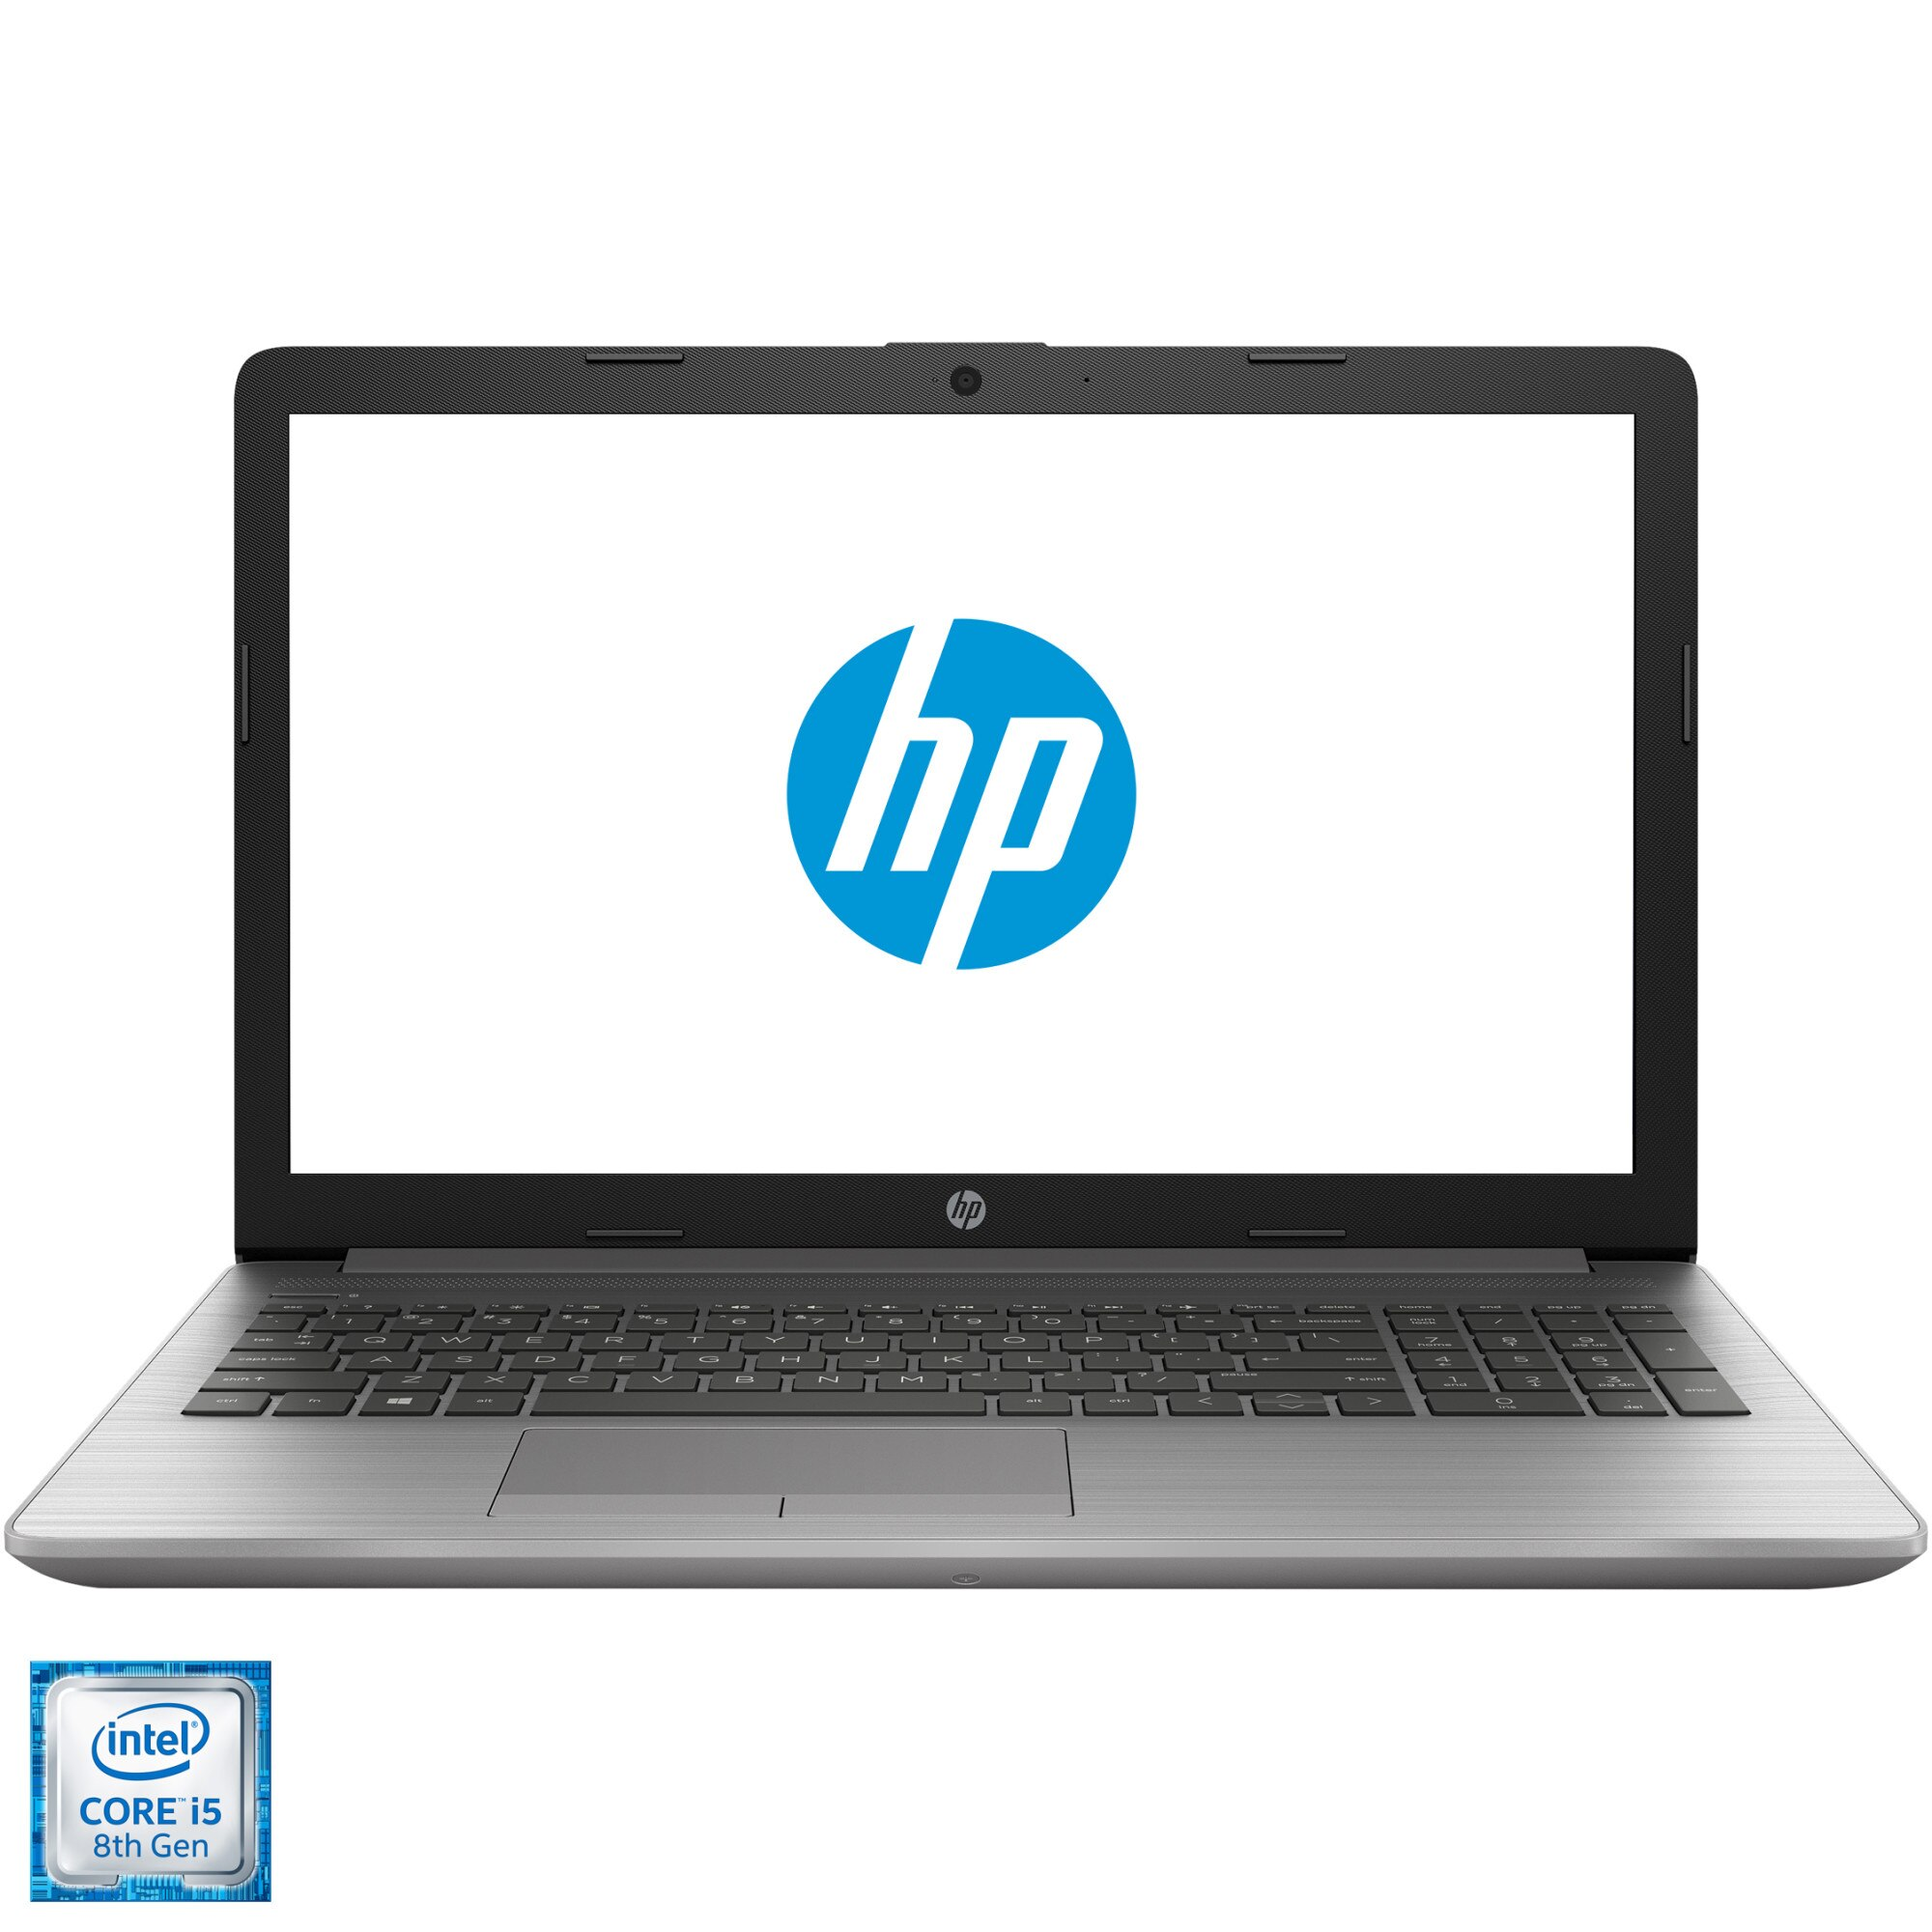 "Fotografie Laptop HP 250 G7 cu procesor Intel® Core™ i5-8265U pana la 3.90 GHz, Whiskey Lake, 15.6"", Full HD, 8GB, 1TB HDD, DVD-RW, Intel UHD Graphics 620, Free DOS, Silver"